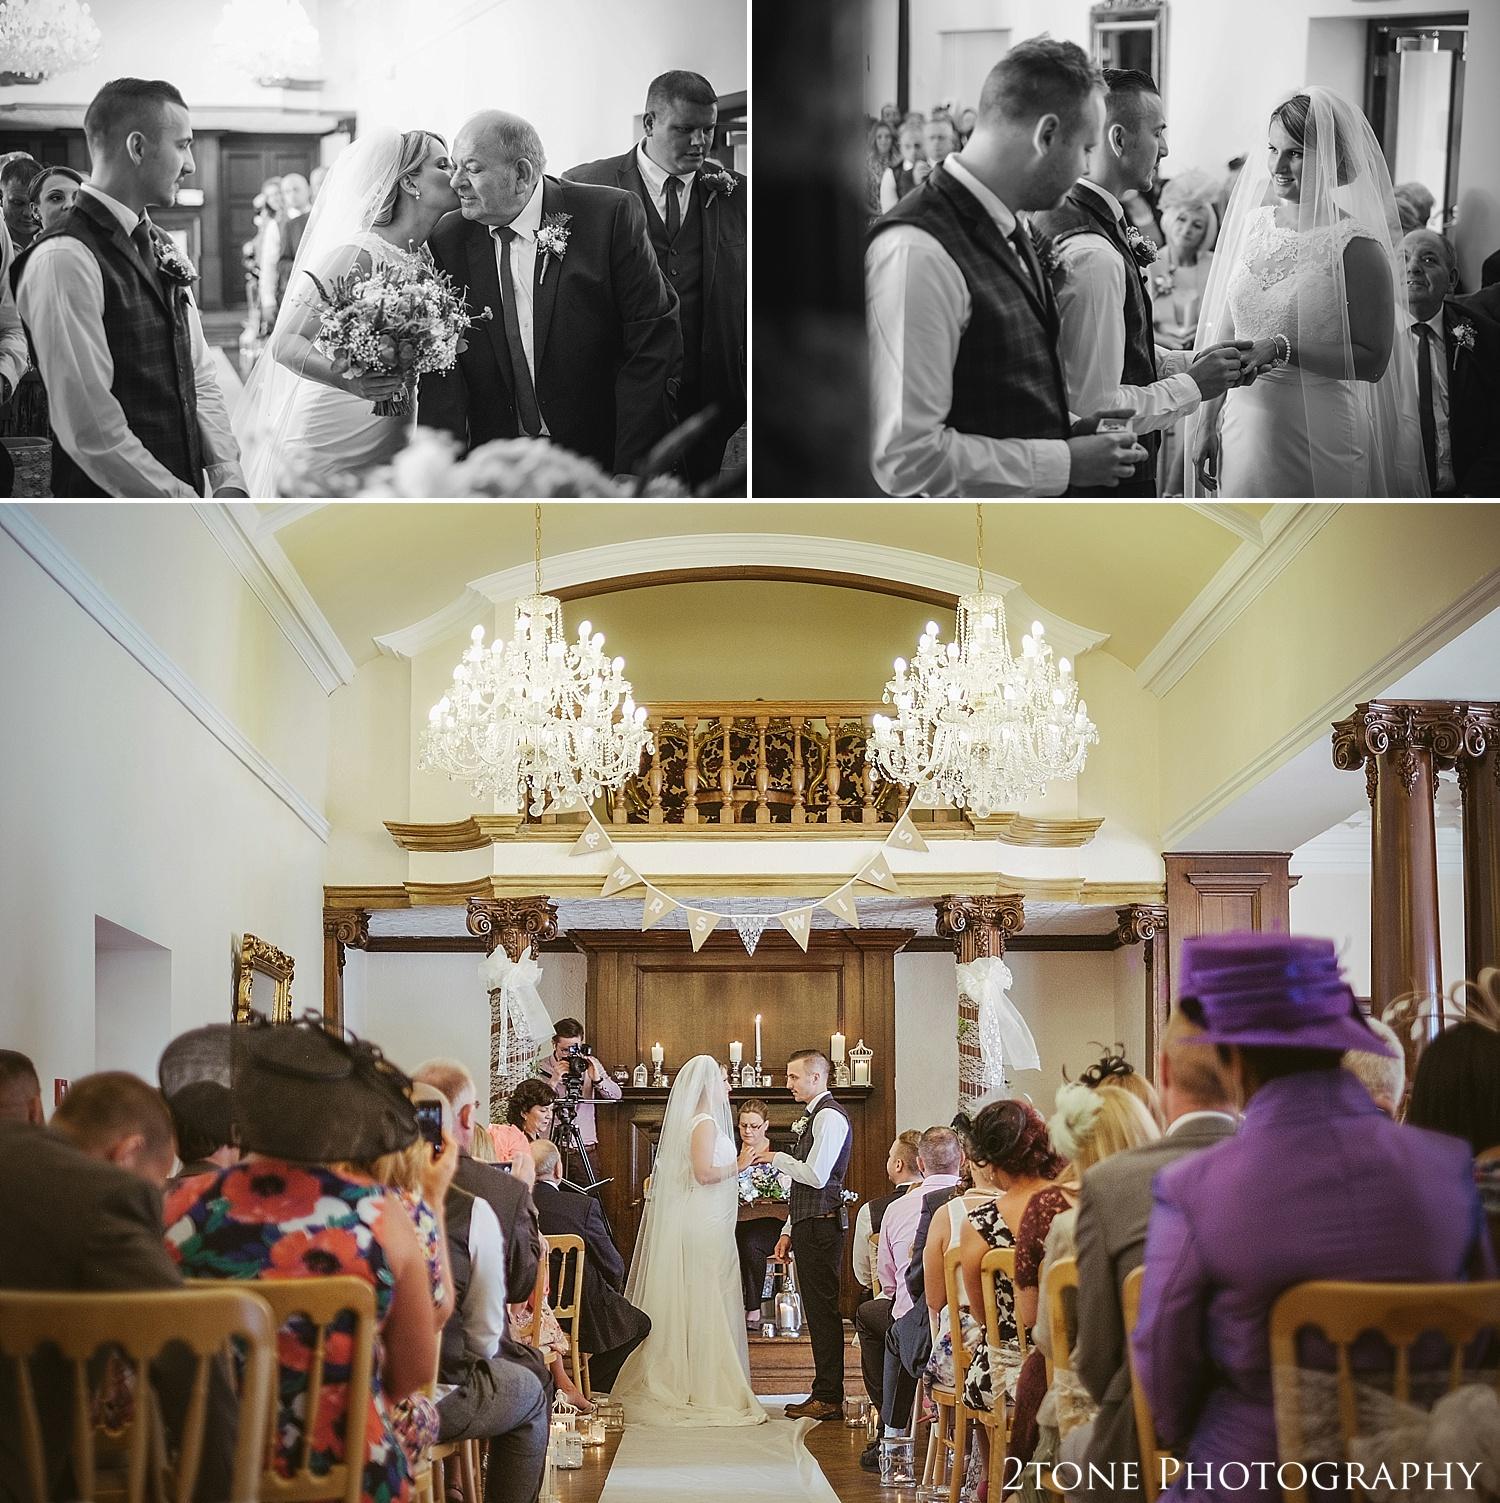 Wedding ceremony in Northumberland.  Wedding photography at Guyzance Hall by wedding photographers www.2tonephotography.co.uk